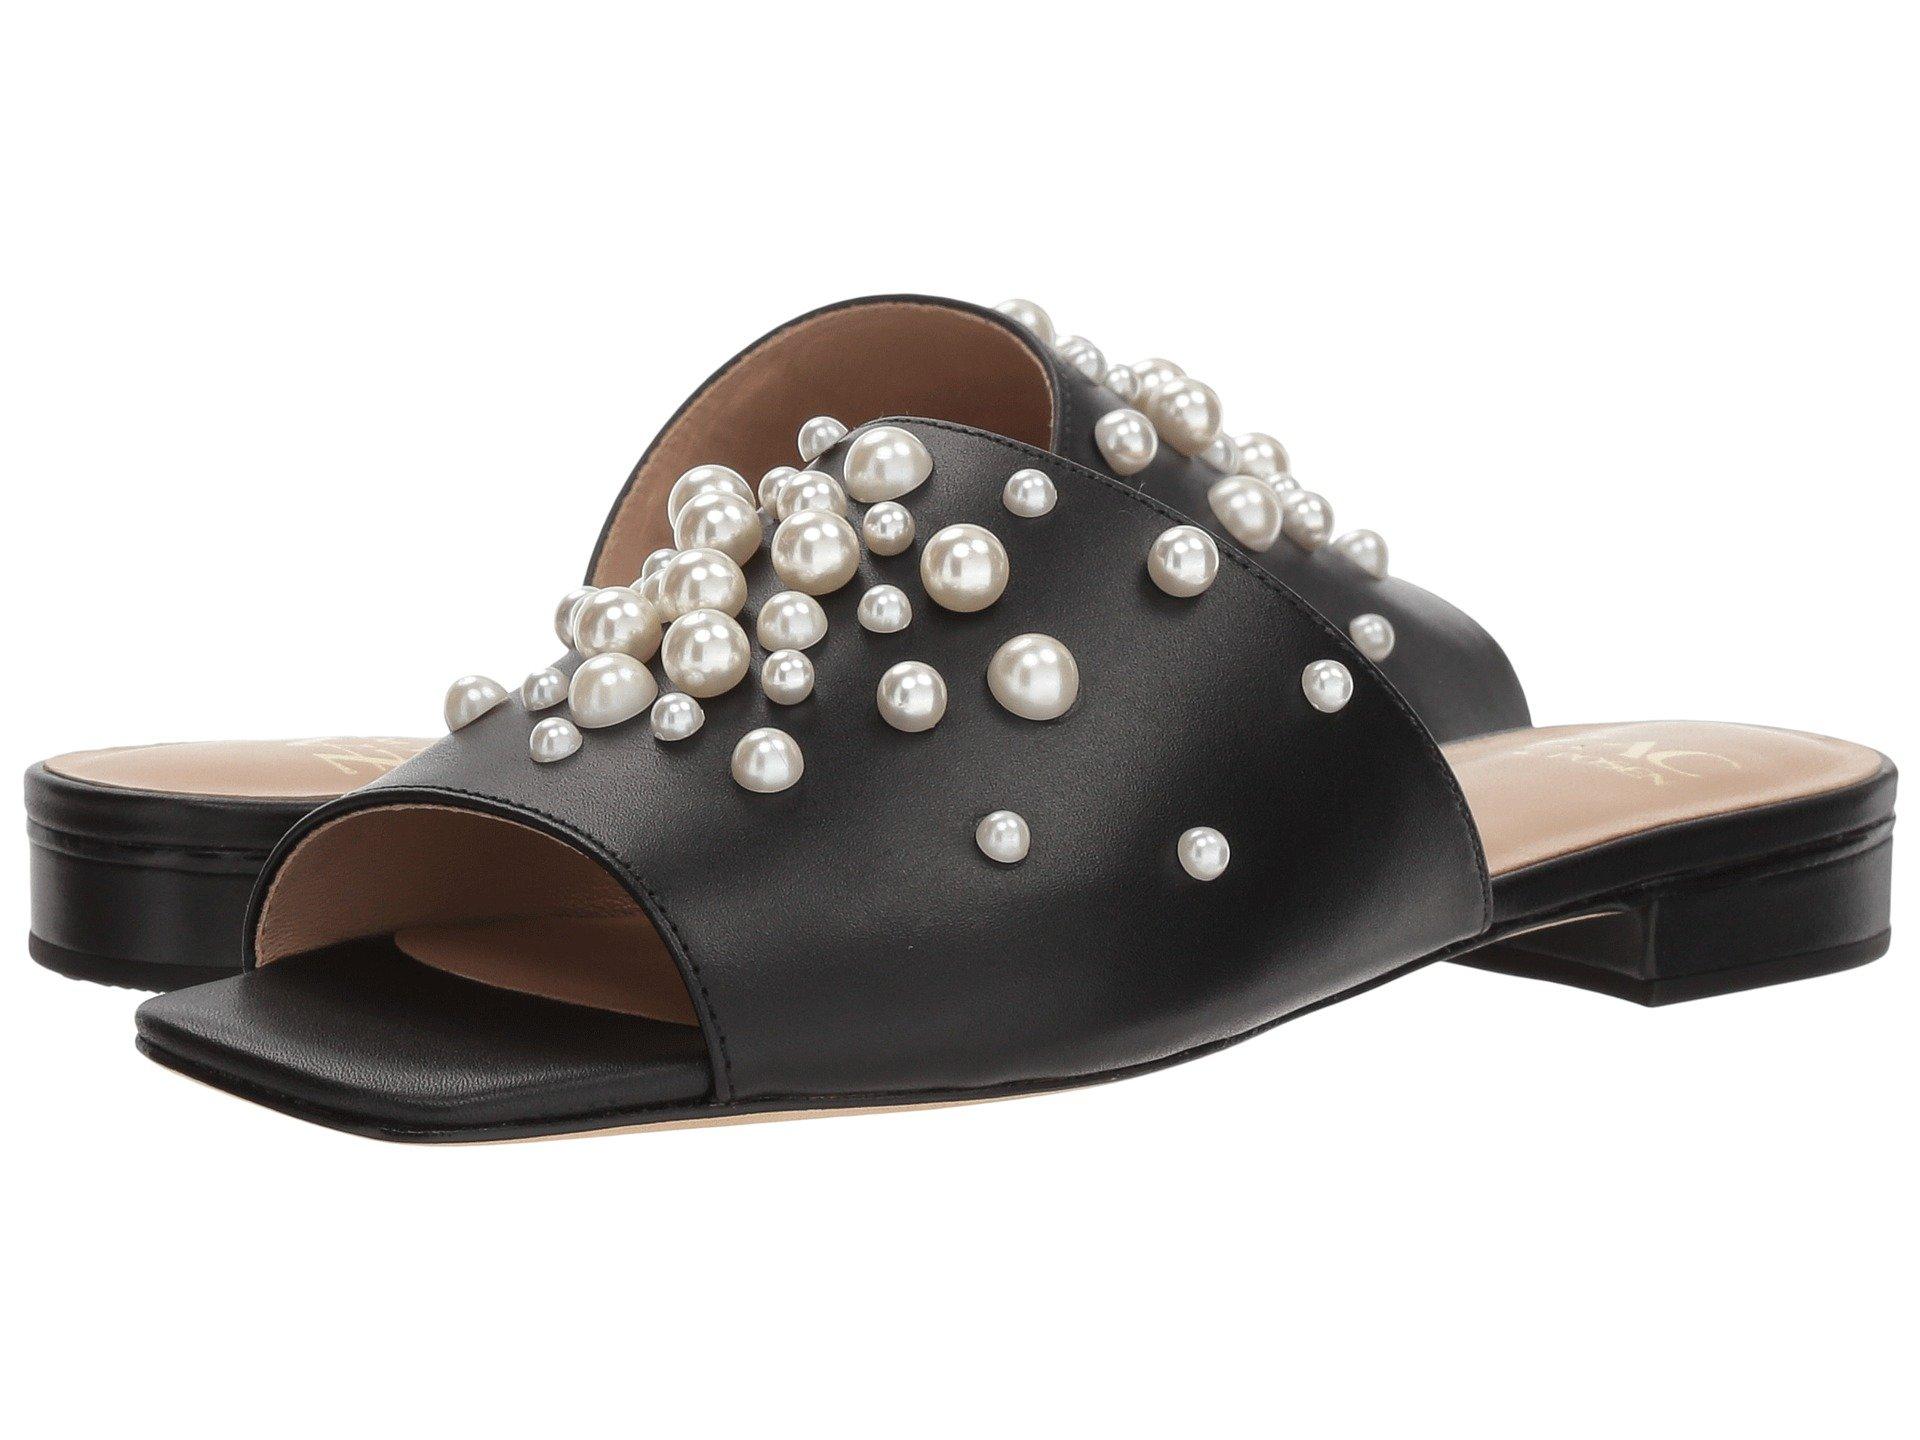 Sandalias para Mujer ZAC Zac Posen Milena Pearls  + ZAC Zac Posen en VeoyCompro.net